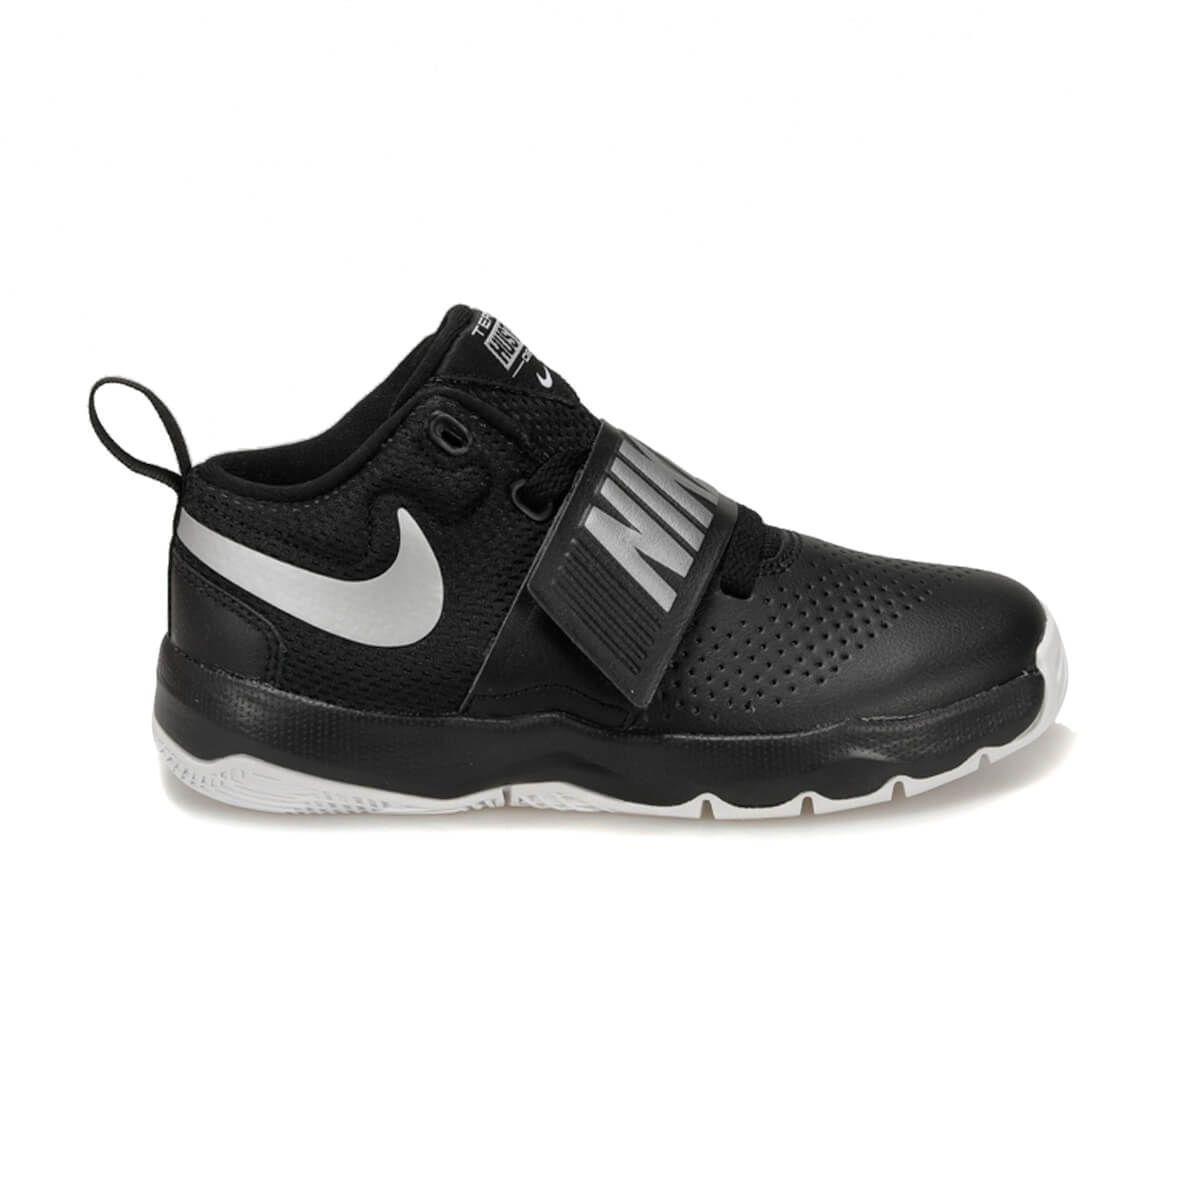 Nike Team Hustle D 8 Ps Siyah Erkek Cocuk Ayakkabi 100291748 Flo Nike Siyah Erkek Ayakkabilar